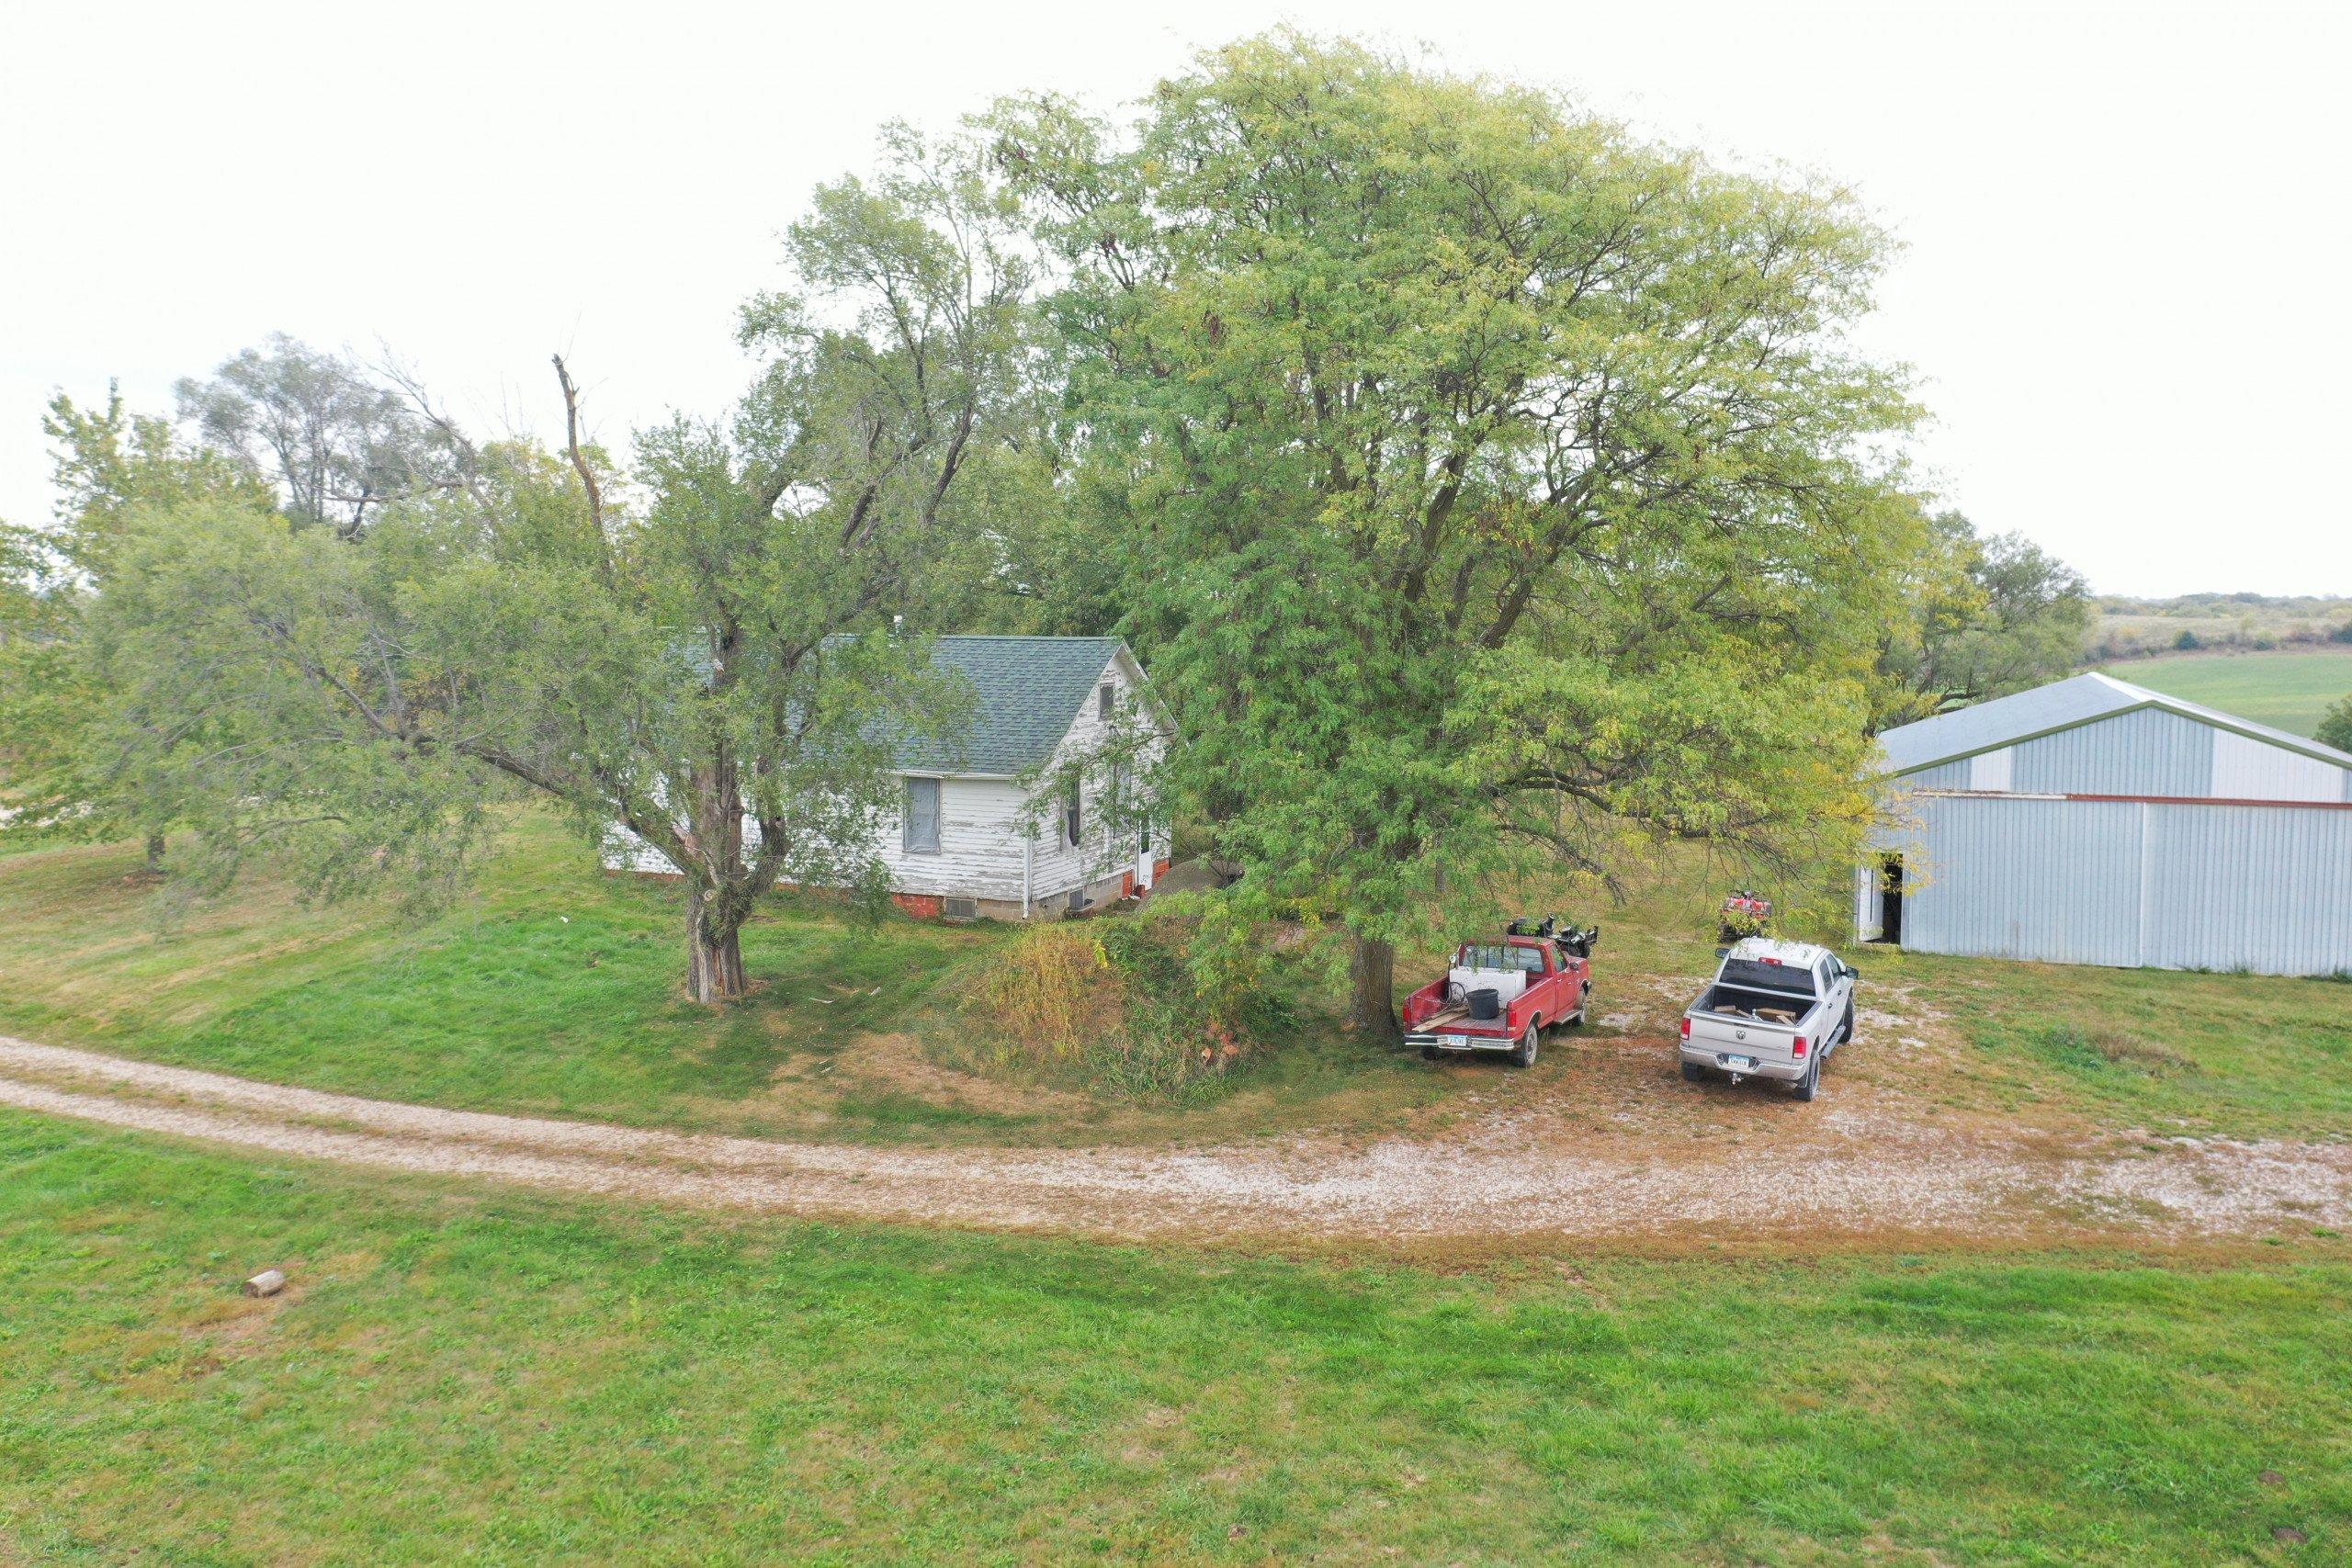 land-warren-county-iowa-200-acres-listing-number-15810-DJI_0573-1.jpg